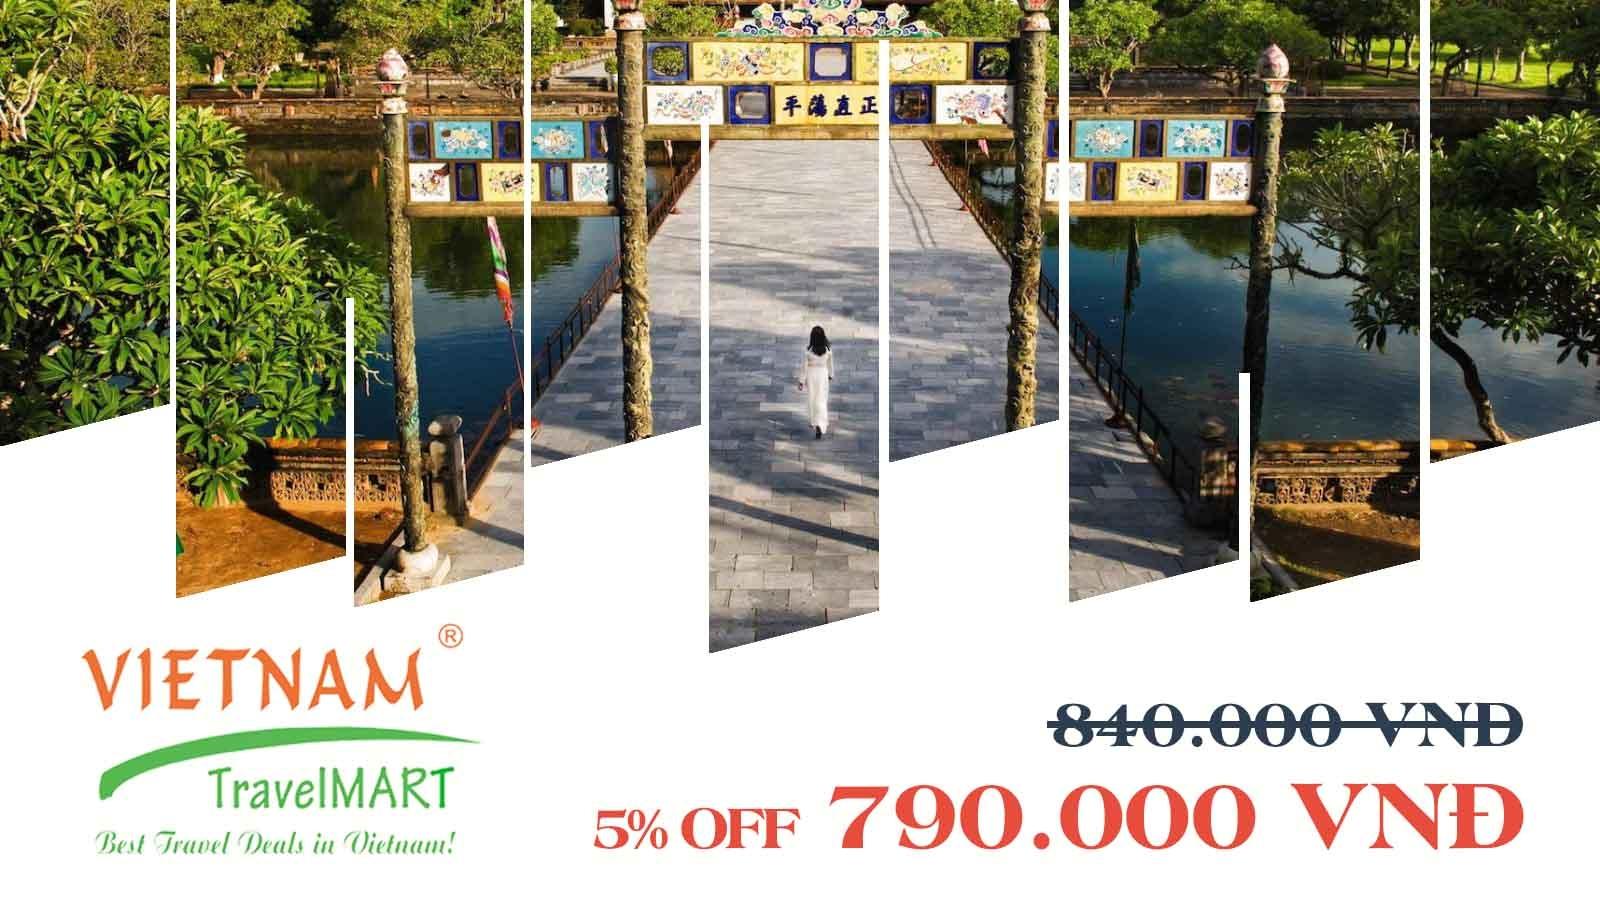 VIETNAM TRAVELMART JSC   5% OFF HUE CITY TOUR  IMPERIAL CITADEL- KHAI DINH TOMB - THIEN MU PAGODA